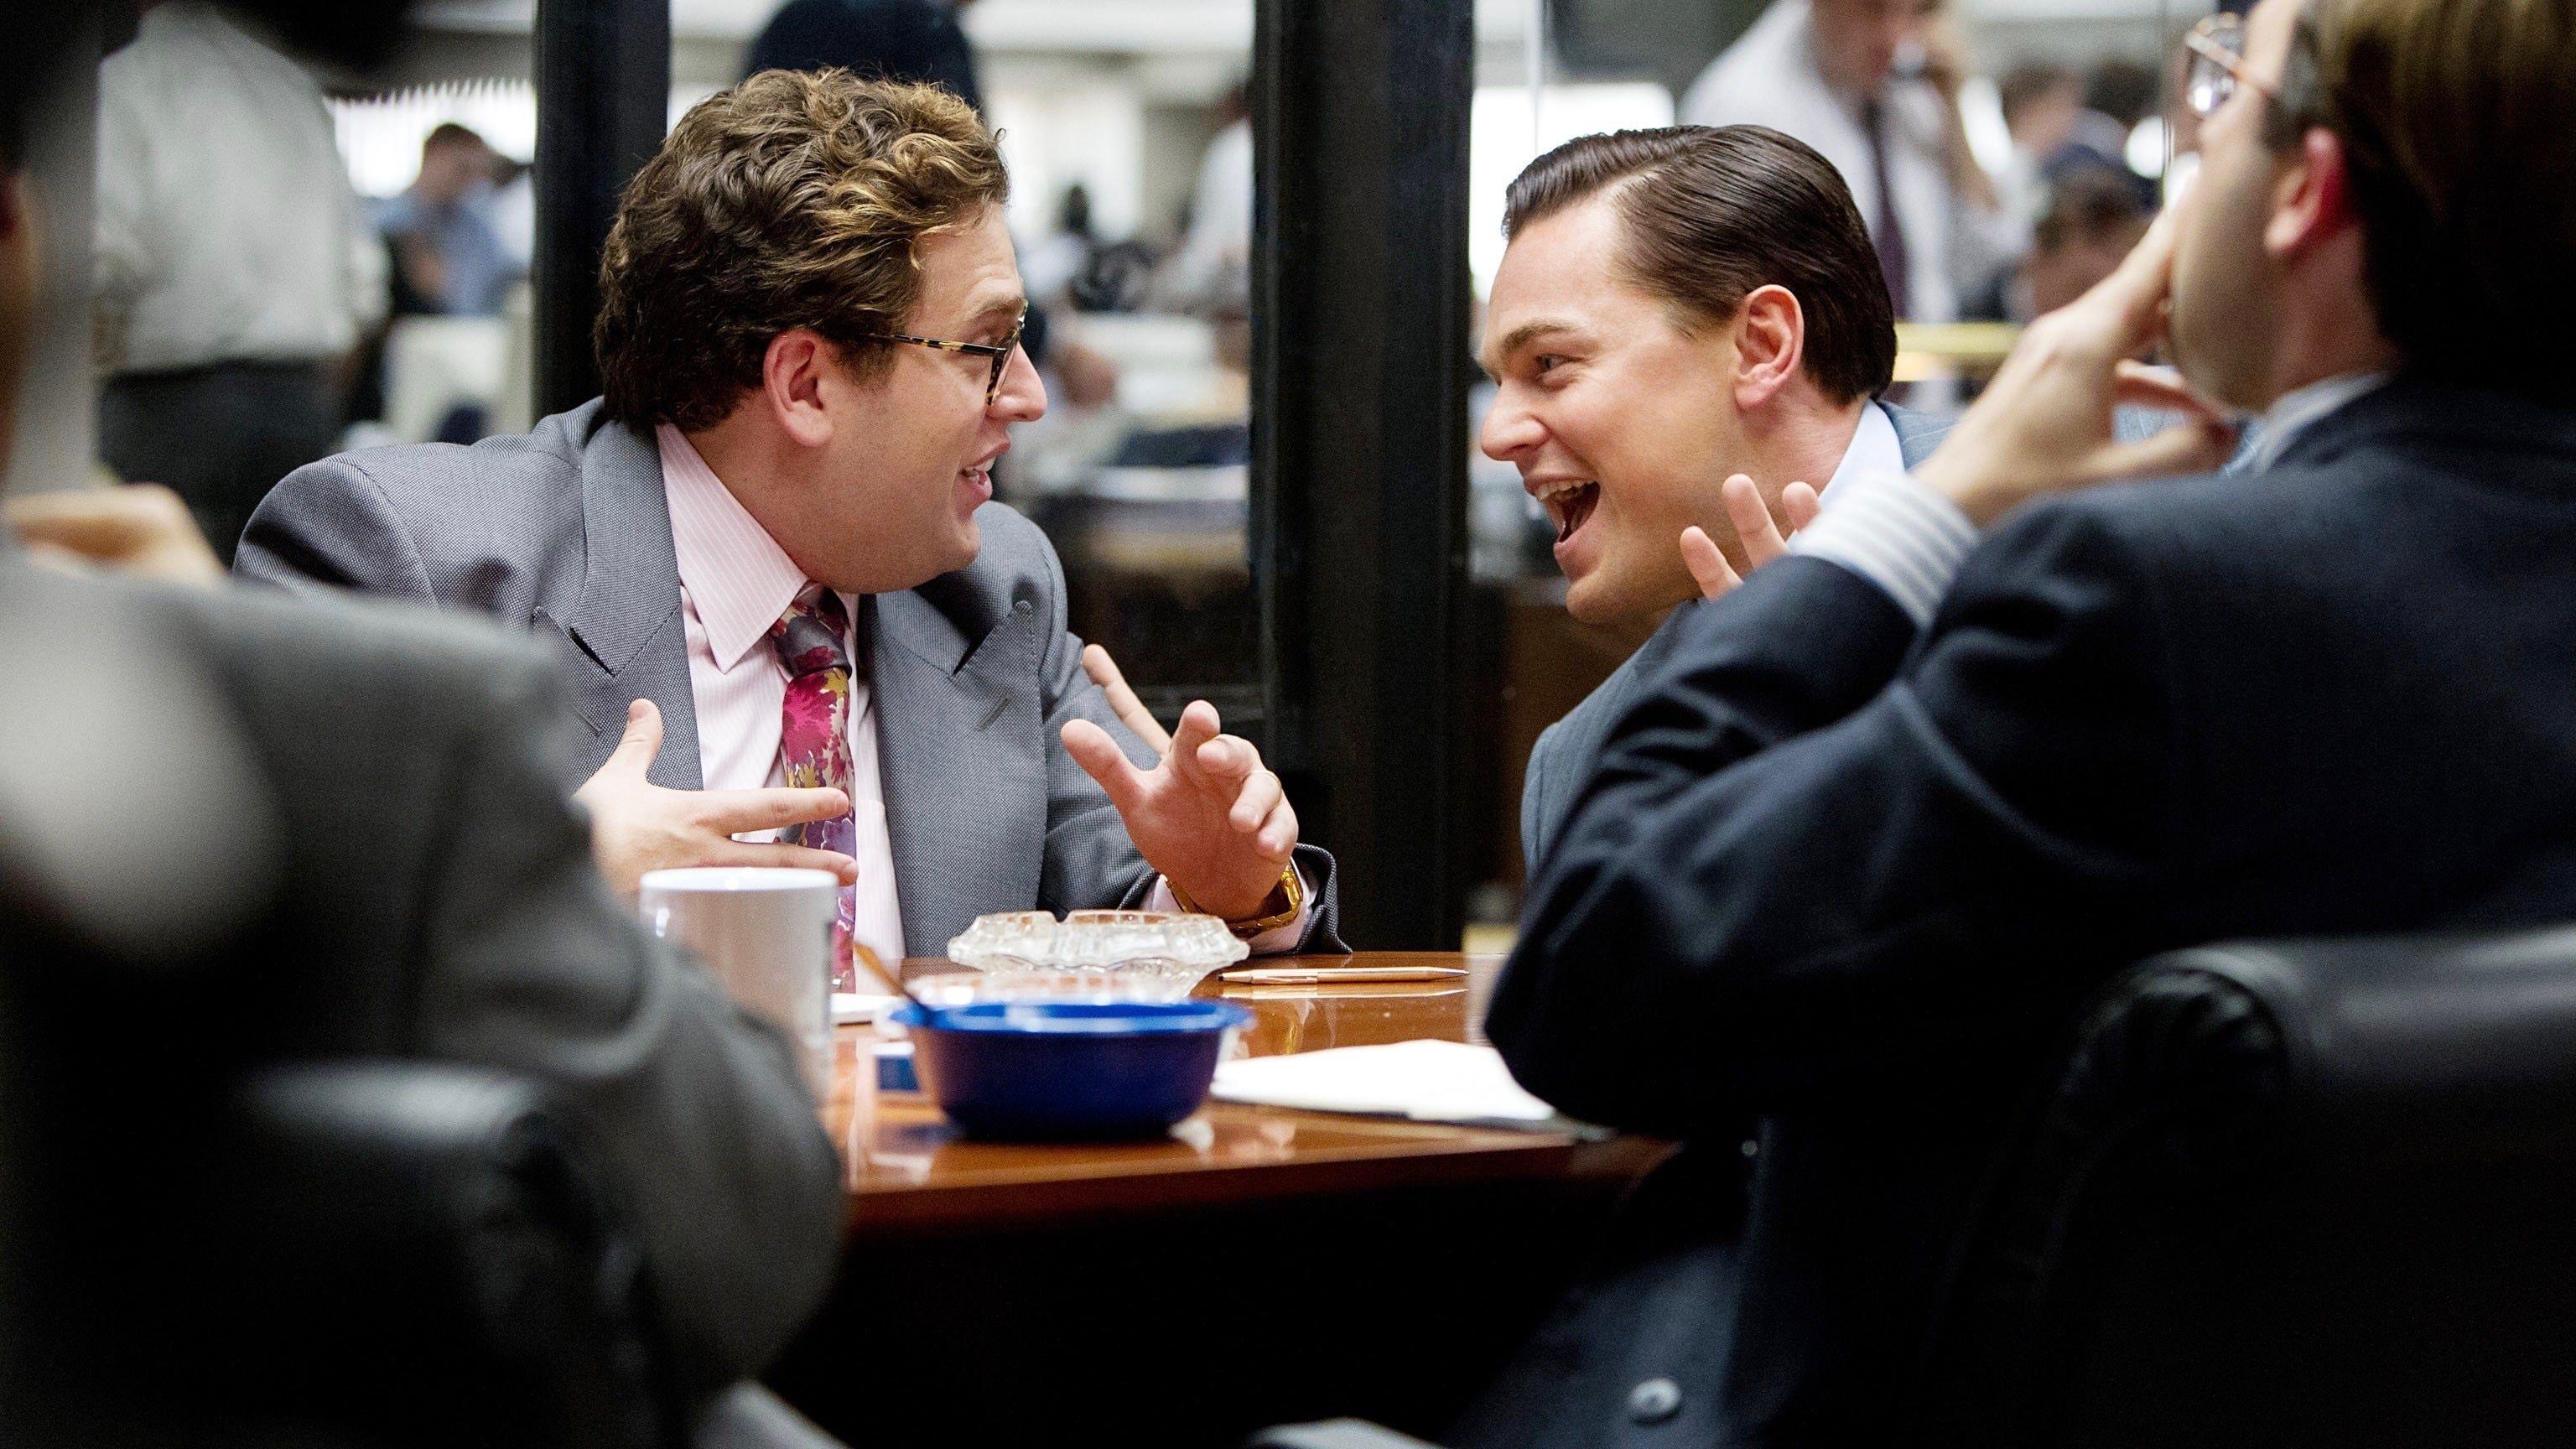 Watch The Wolf Of Wall Street 2013 Putlocker Film Complet Streaming Eind Jaren 80 Jordan Belfort Is Een Aan Drug Wolf Of Wall Street Wall Street Prime Movies